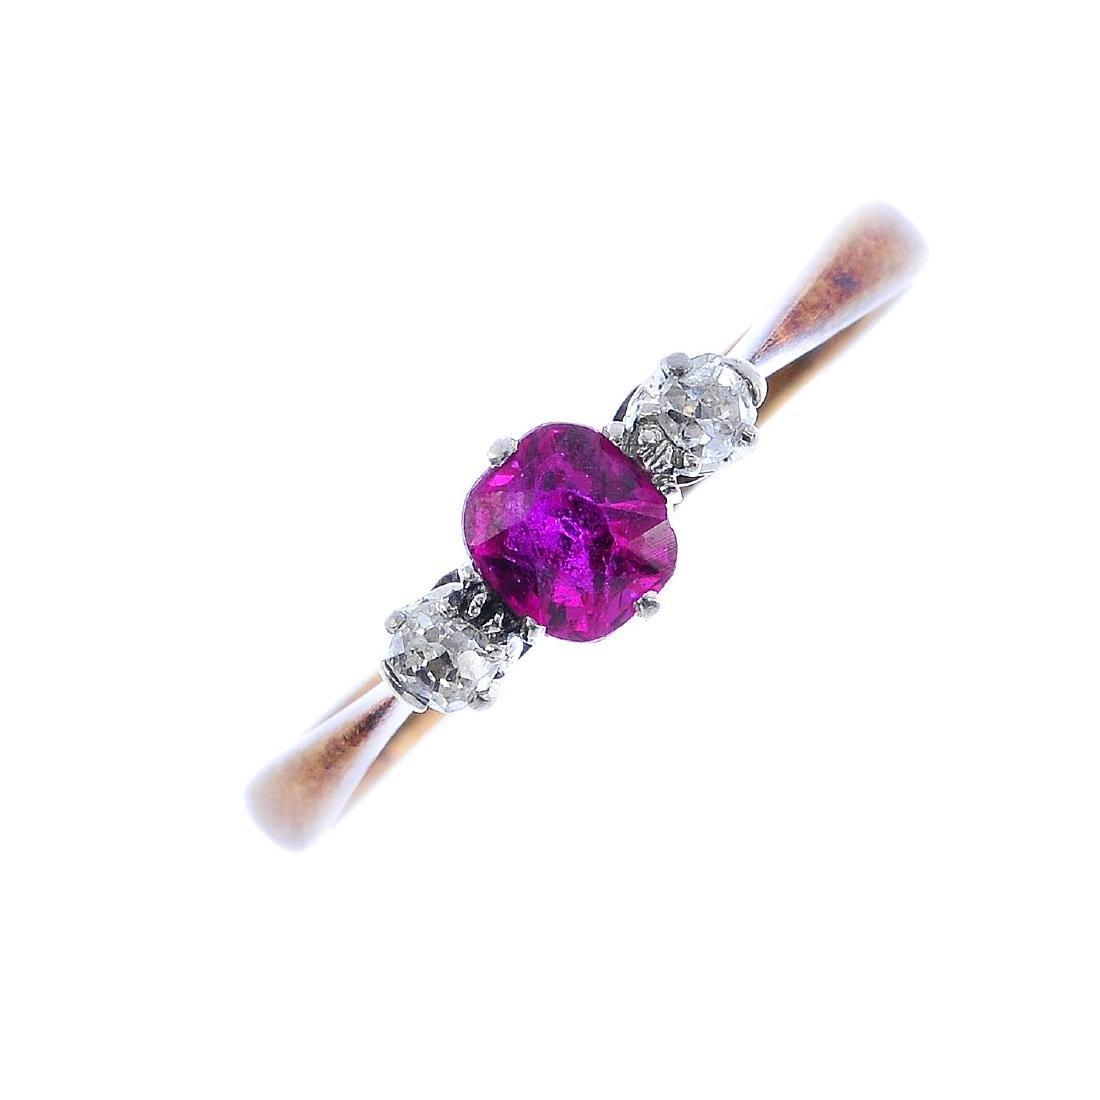 A ruby and diamond three-stone ring. The cushion-shape